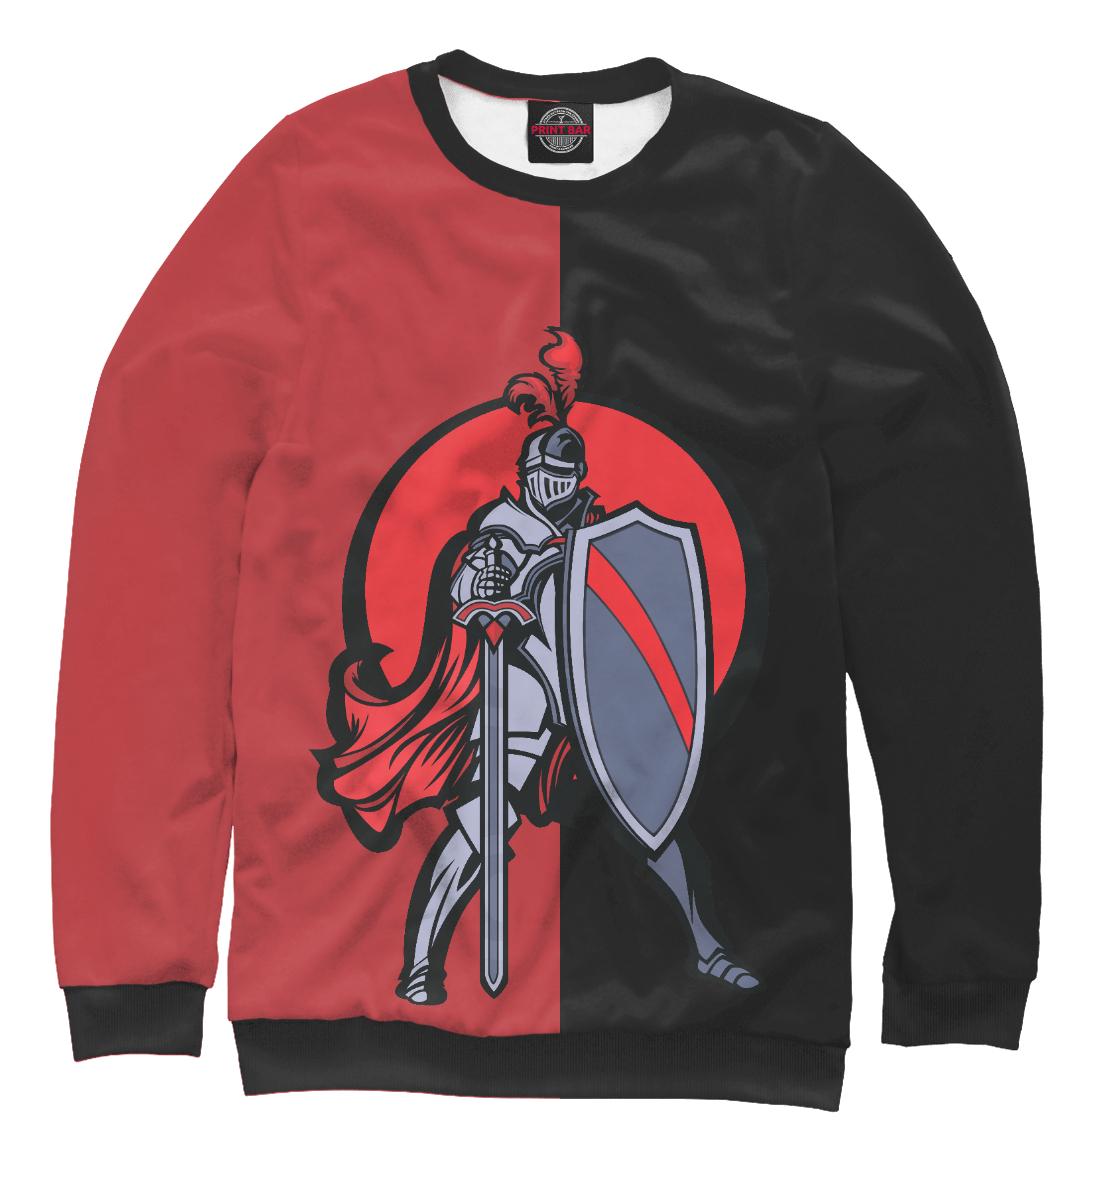 Купить Рыцарь, Printbar, Свитшоты, APD-847240-swi-2